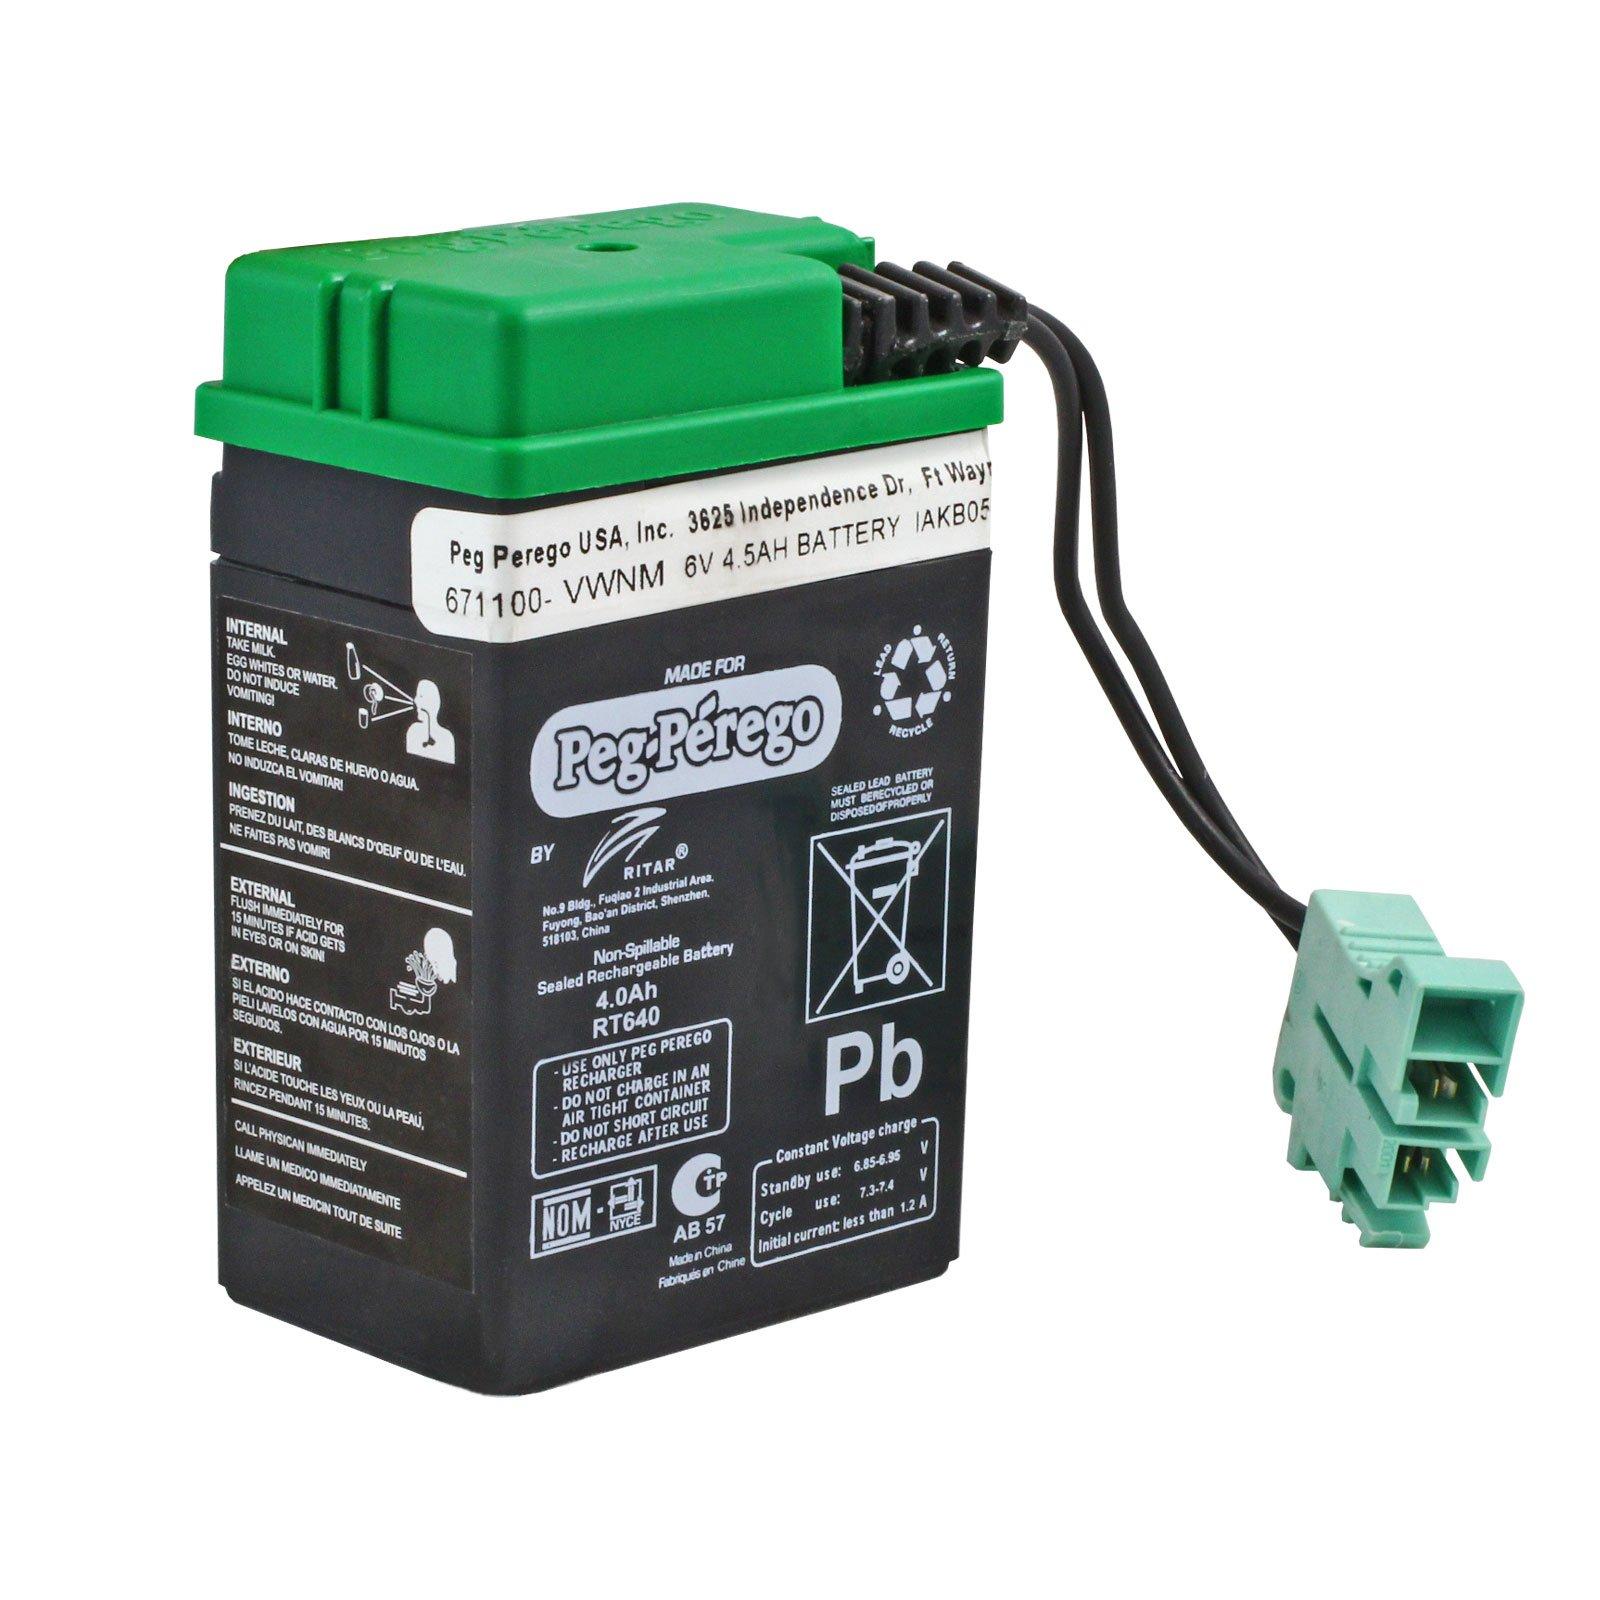 replacement peg perego 6 volt green battery for peg perego. Black Bedroom Furniture Sets. Home Design Ideas